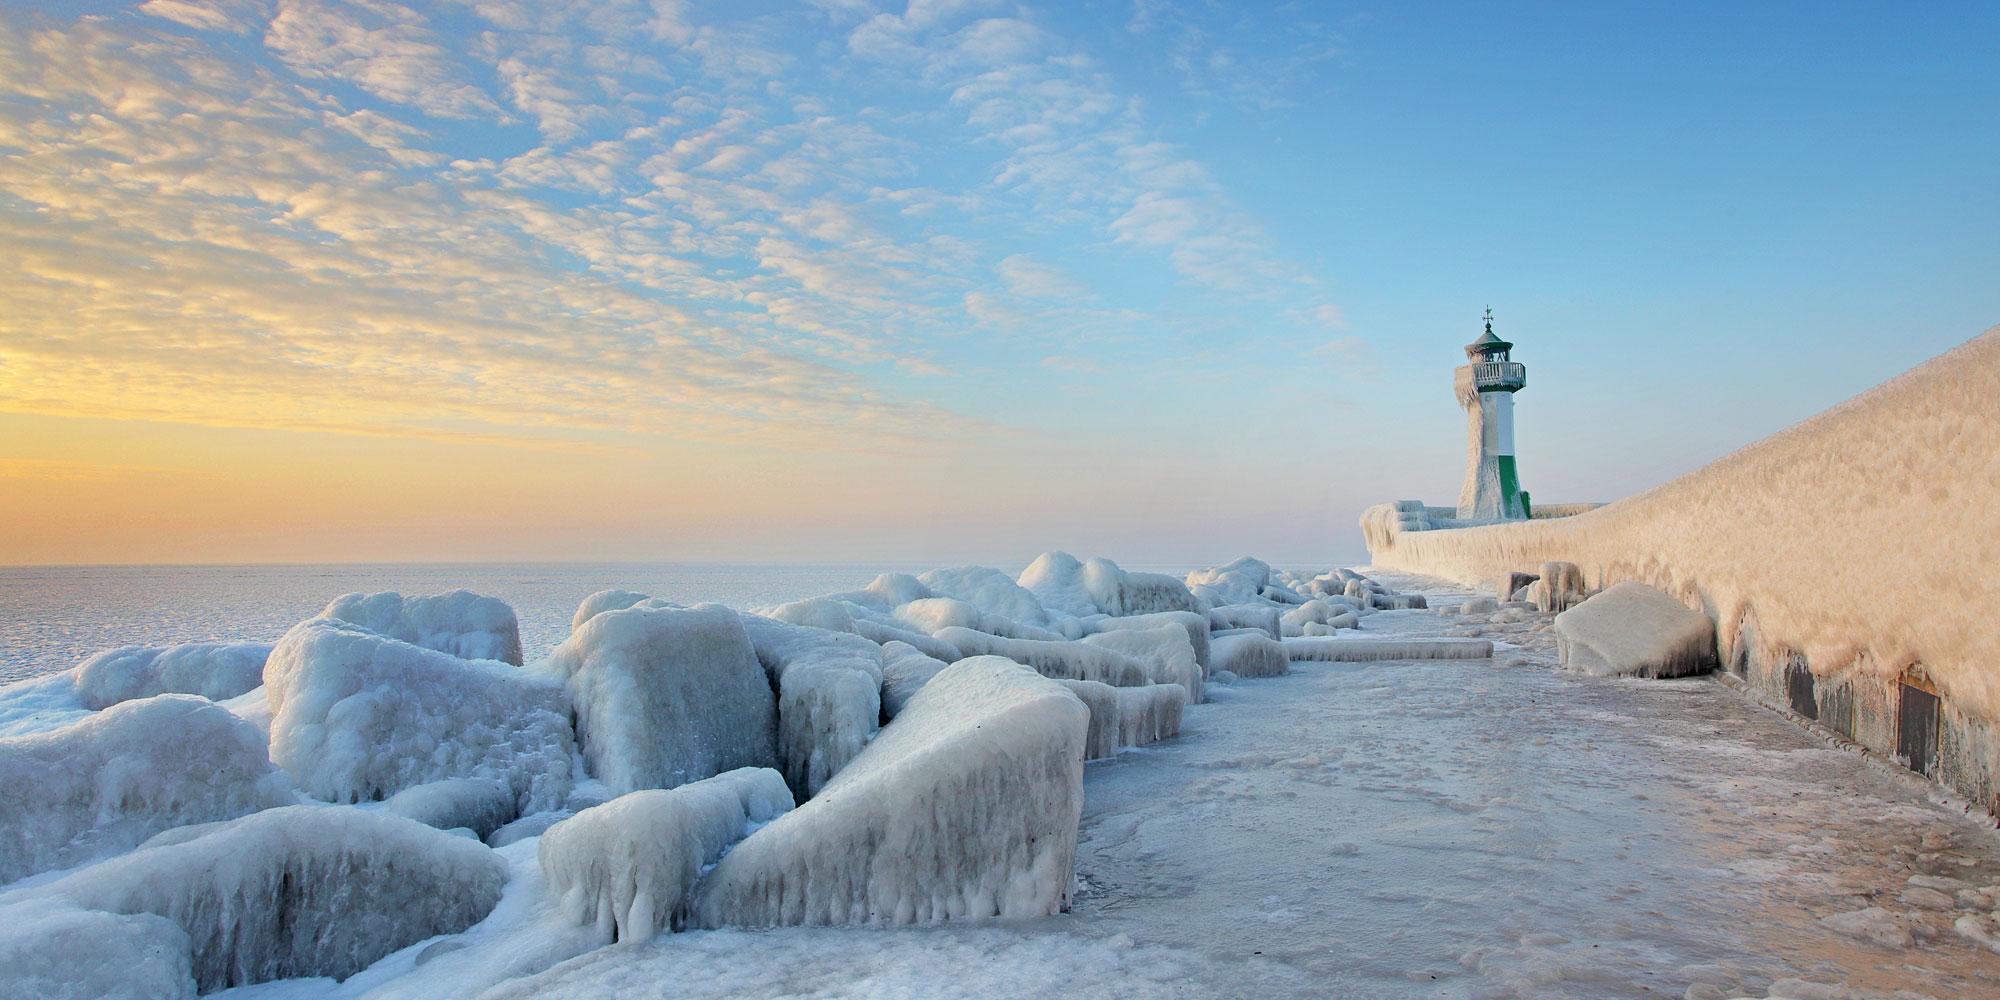 зима на Балтийском море. Блиц: снежная зима